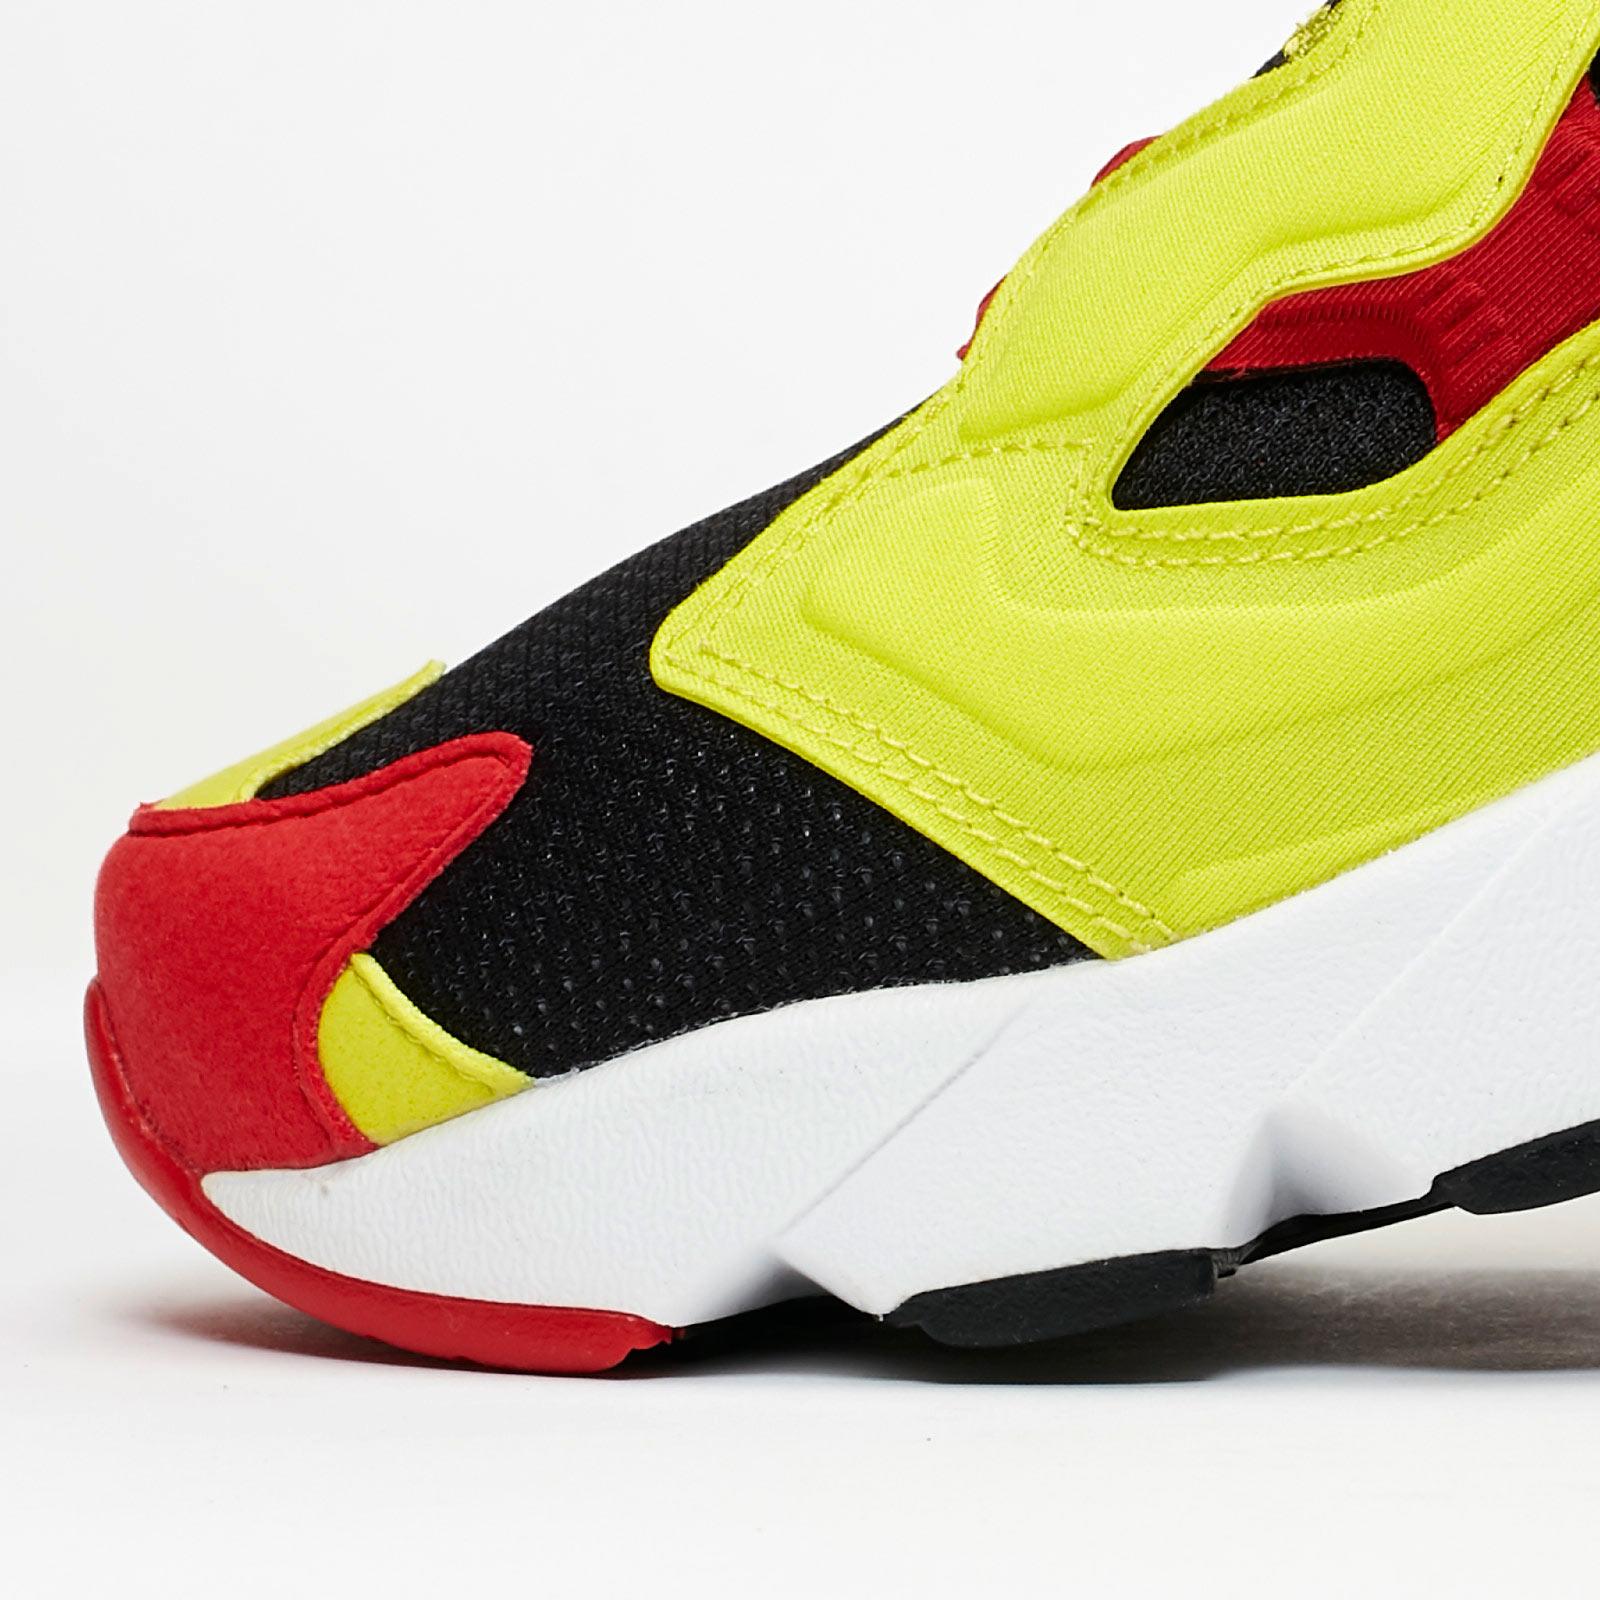 Reebok Instapump Fury Og Black/green/red In Yellow